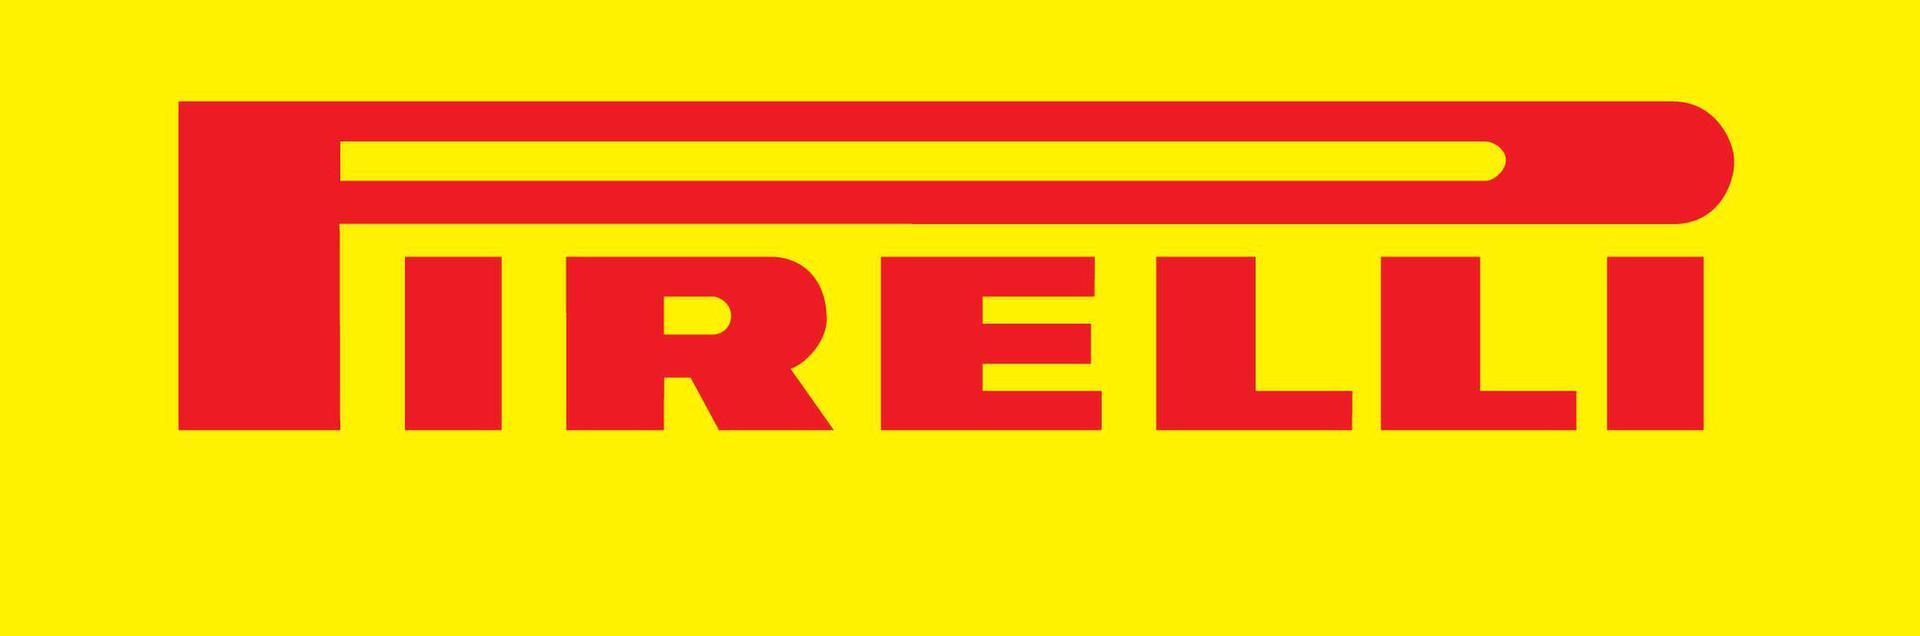 logo+pirelli+edit